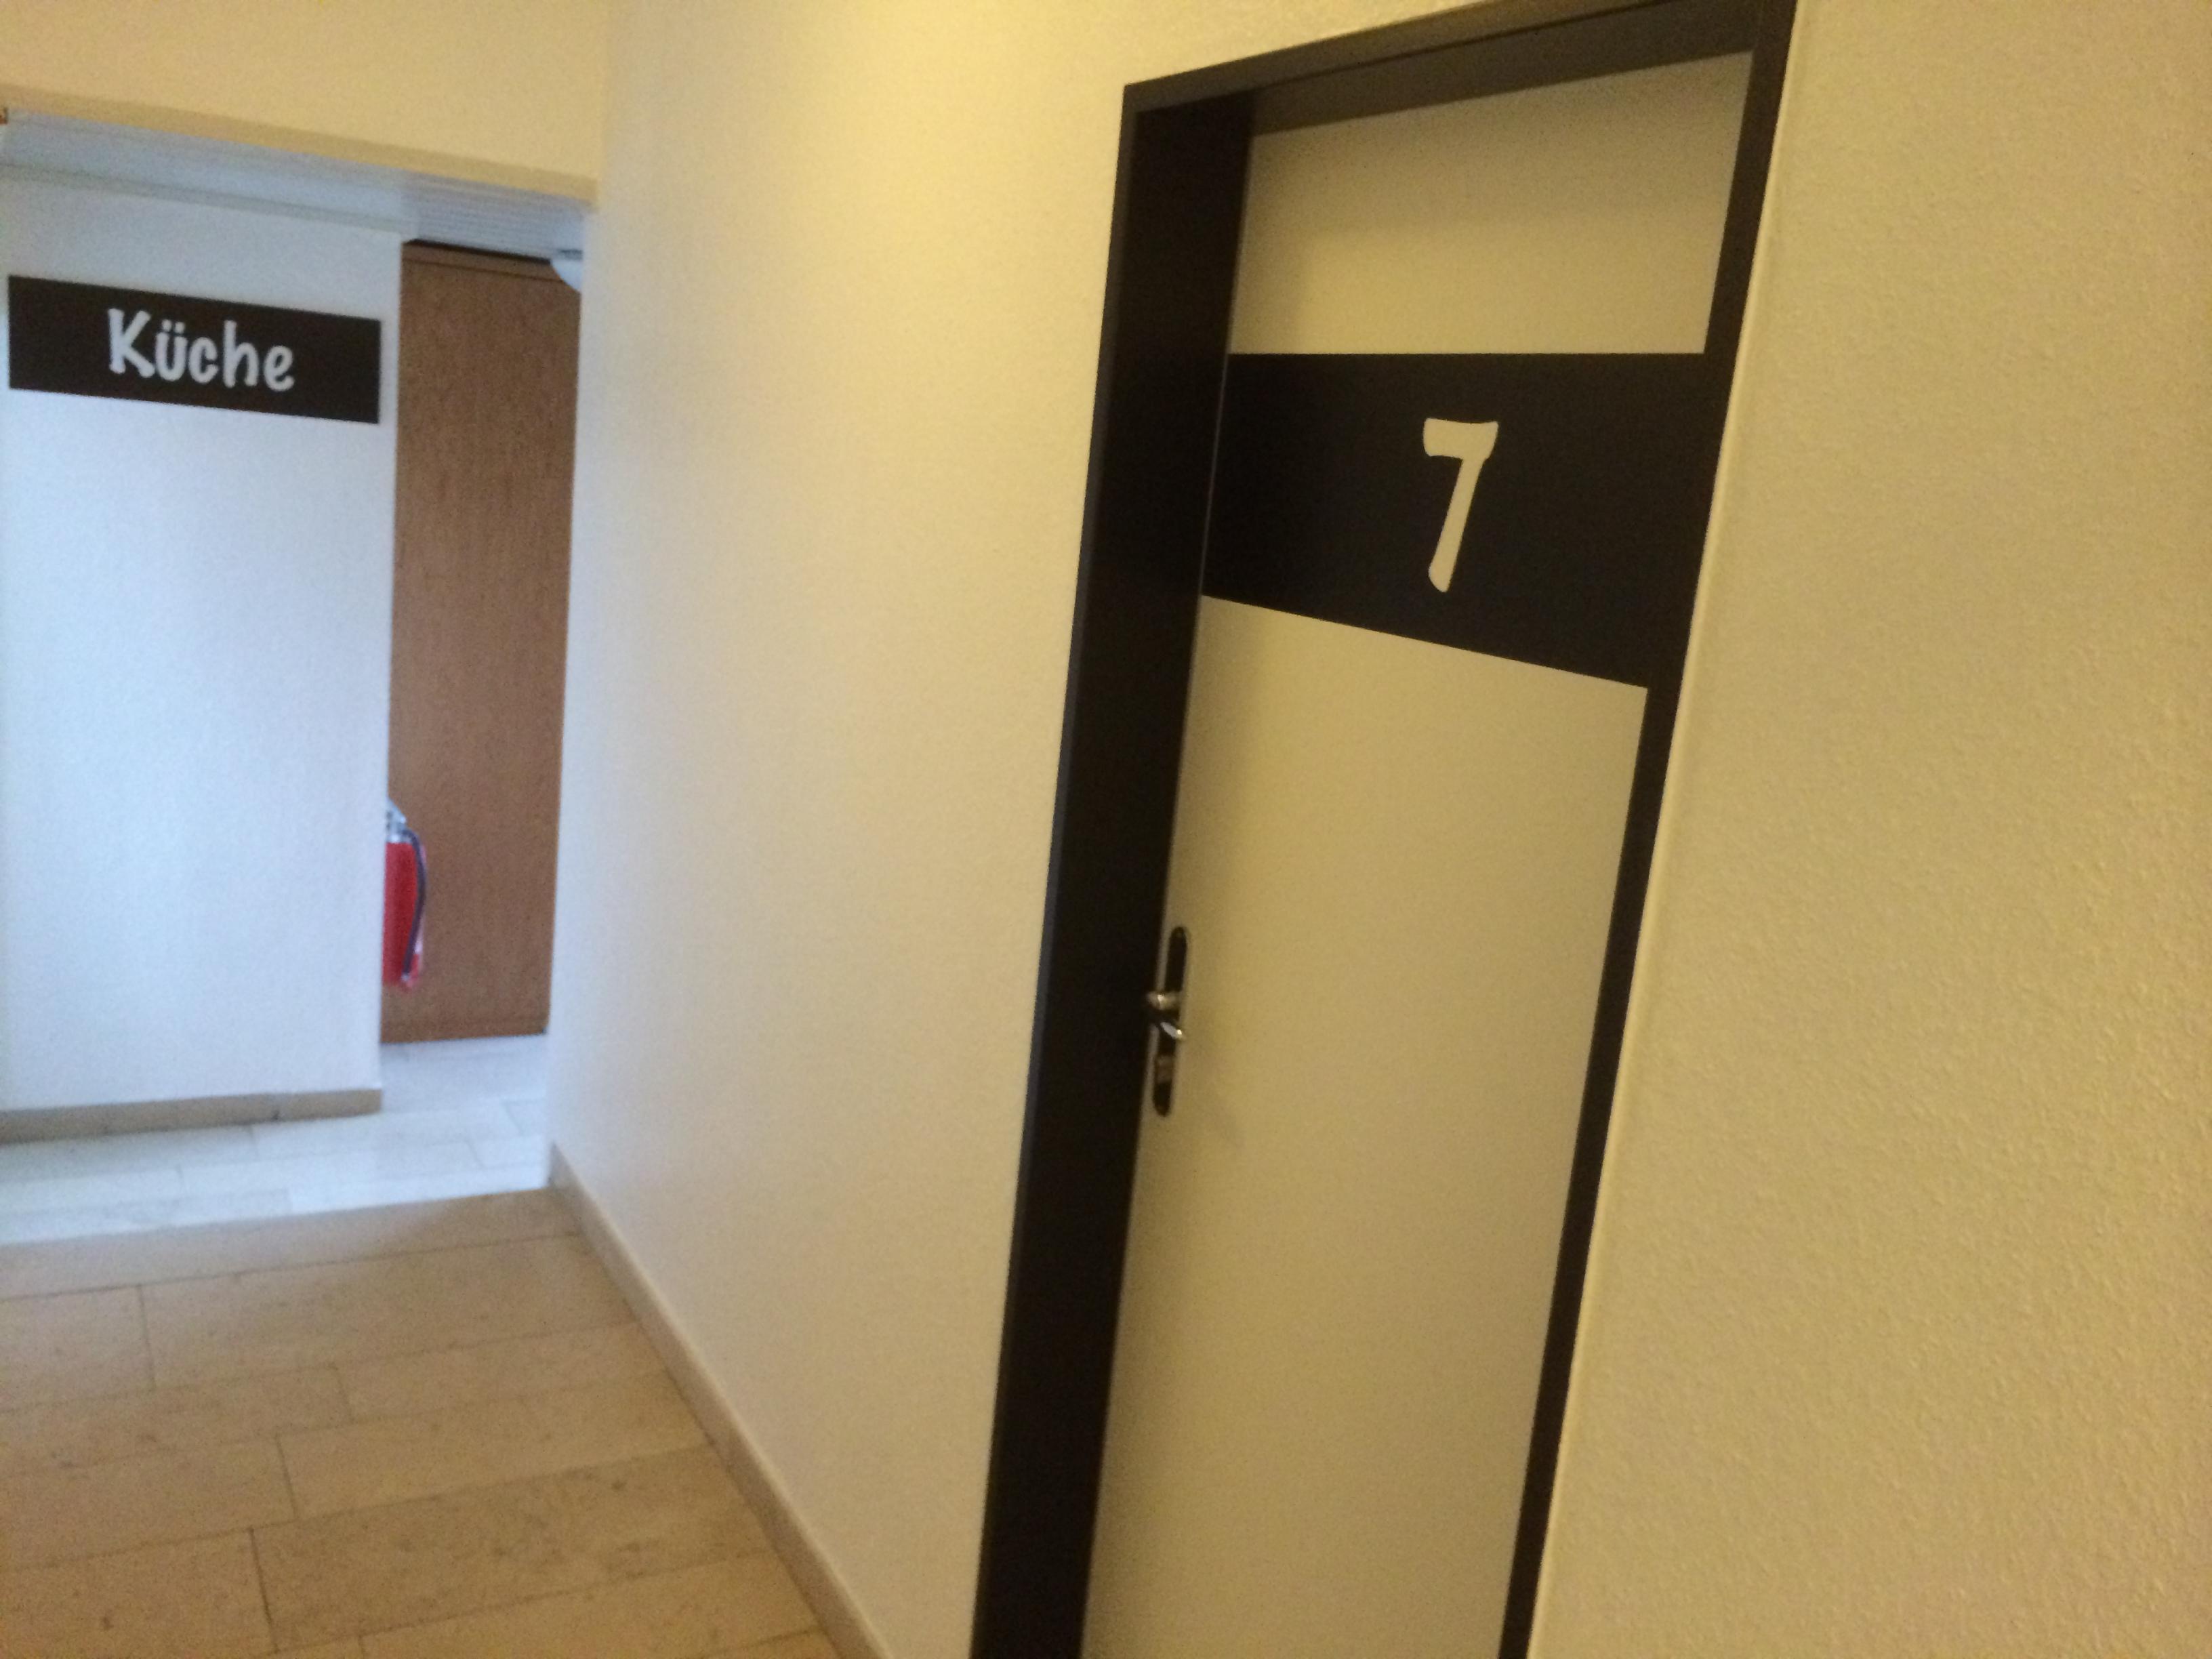 flurmodernisierung des hotels mit led t rschildern ist abgeschlossen hotel pension. Black Bedroom Furniture Sets. Home Design Ideas